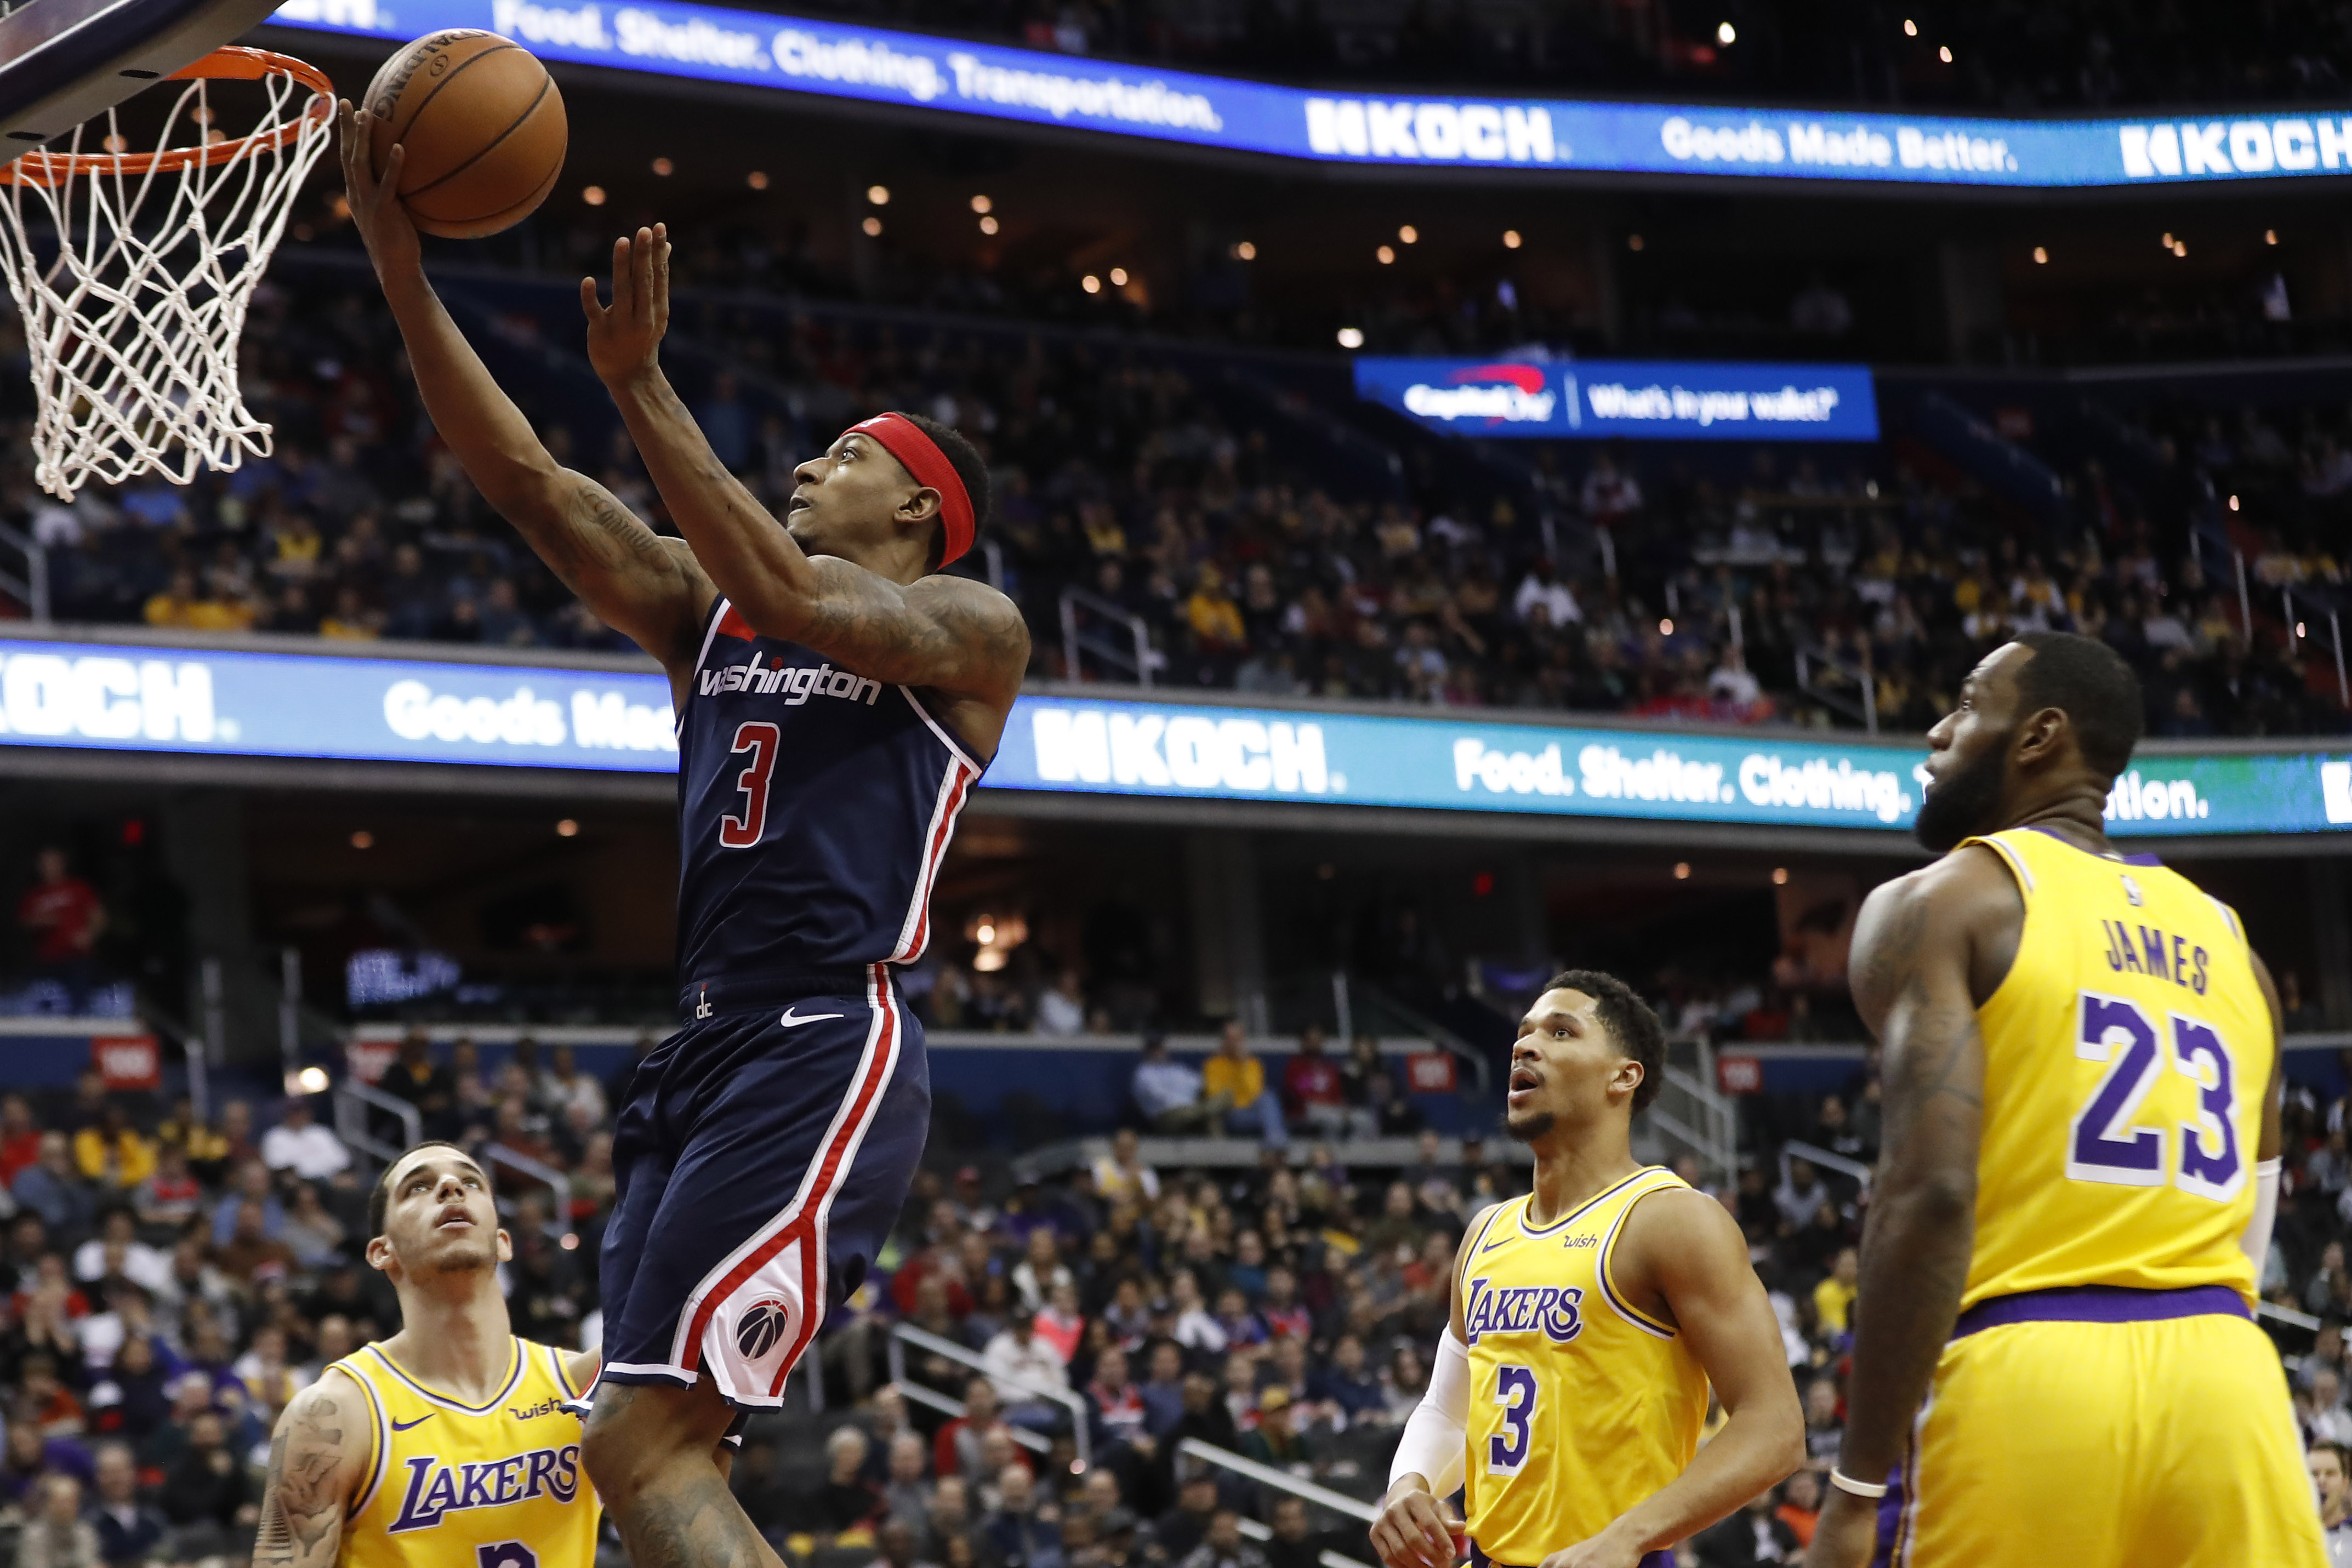 NBA trade rumors: Lakers interested in Bradley Beal, Kyle Lowry